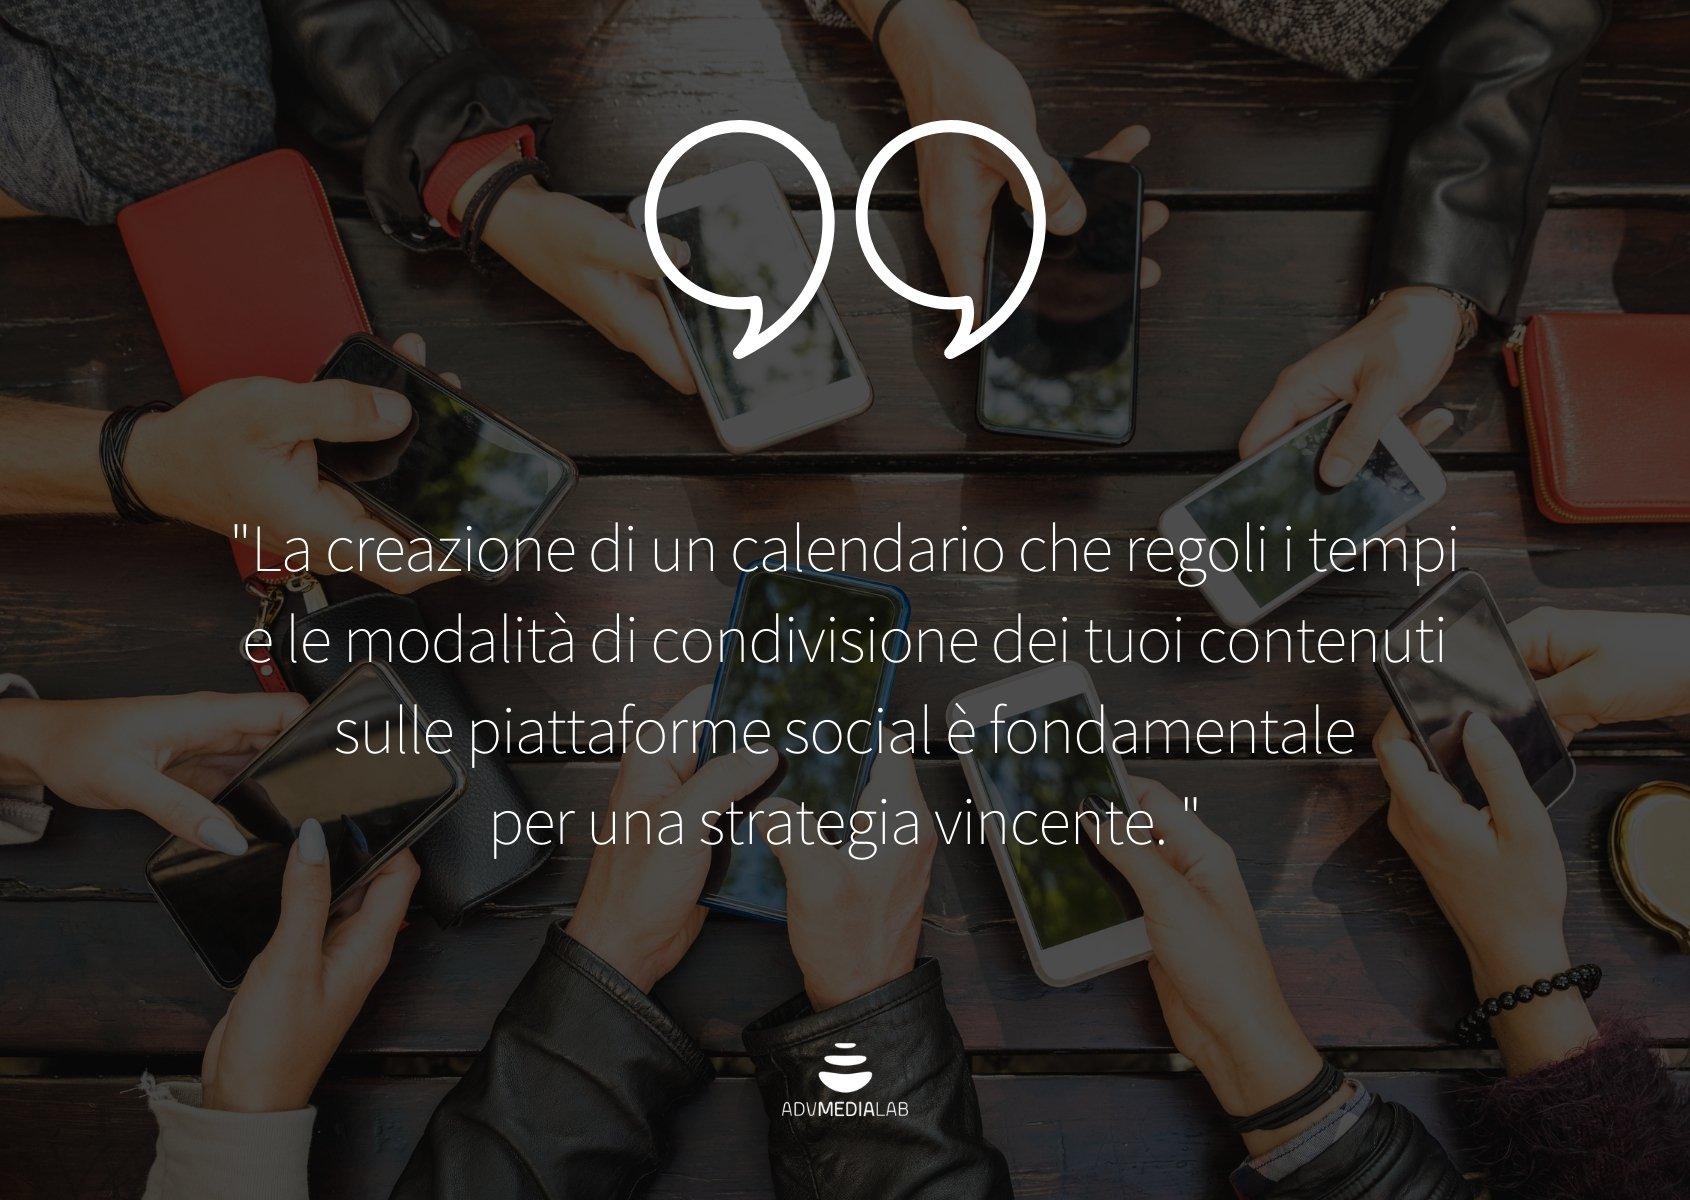 Blog-post-SOCIAL-MEDIA-CHECKLIST-2021-quote4